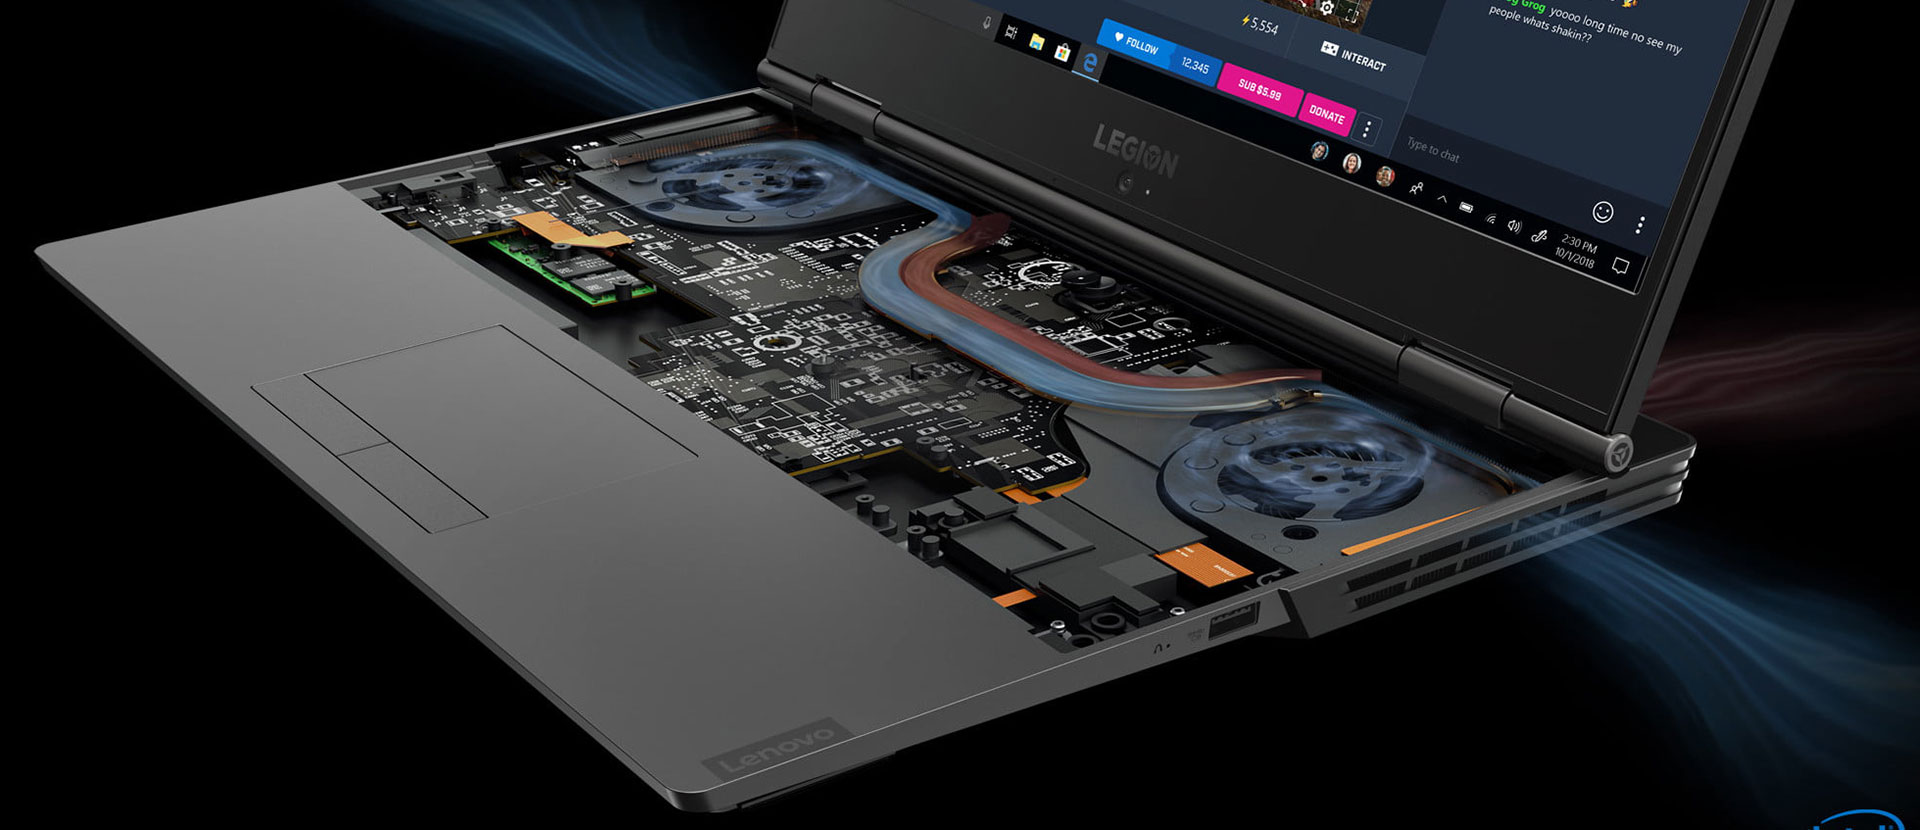 2019 Lenovo Legion Y540 and Y740 gaming laptops - RTX